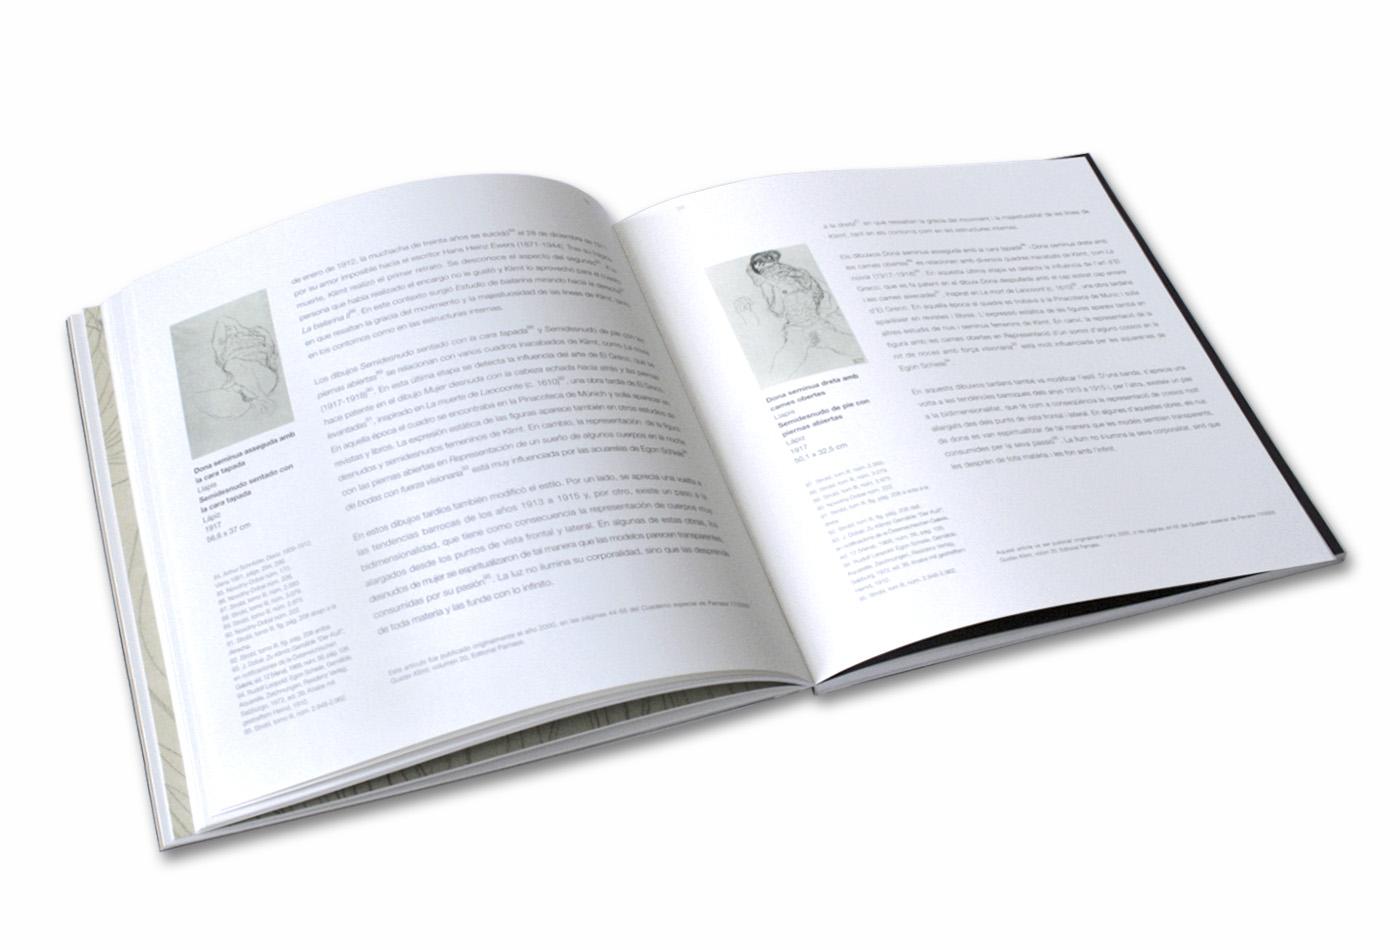 la-caixa-gustav-klimt-editorial-llibre